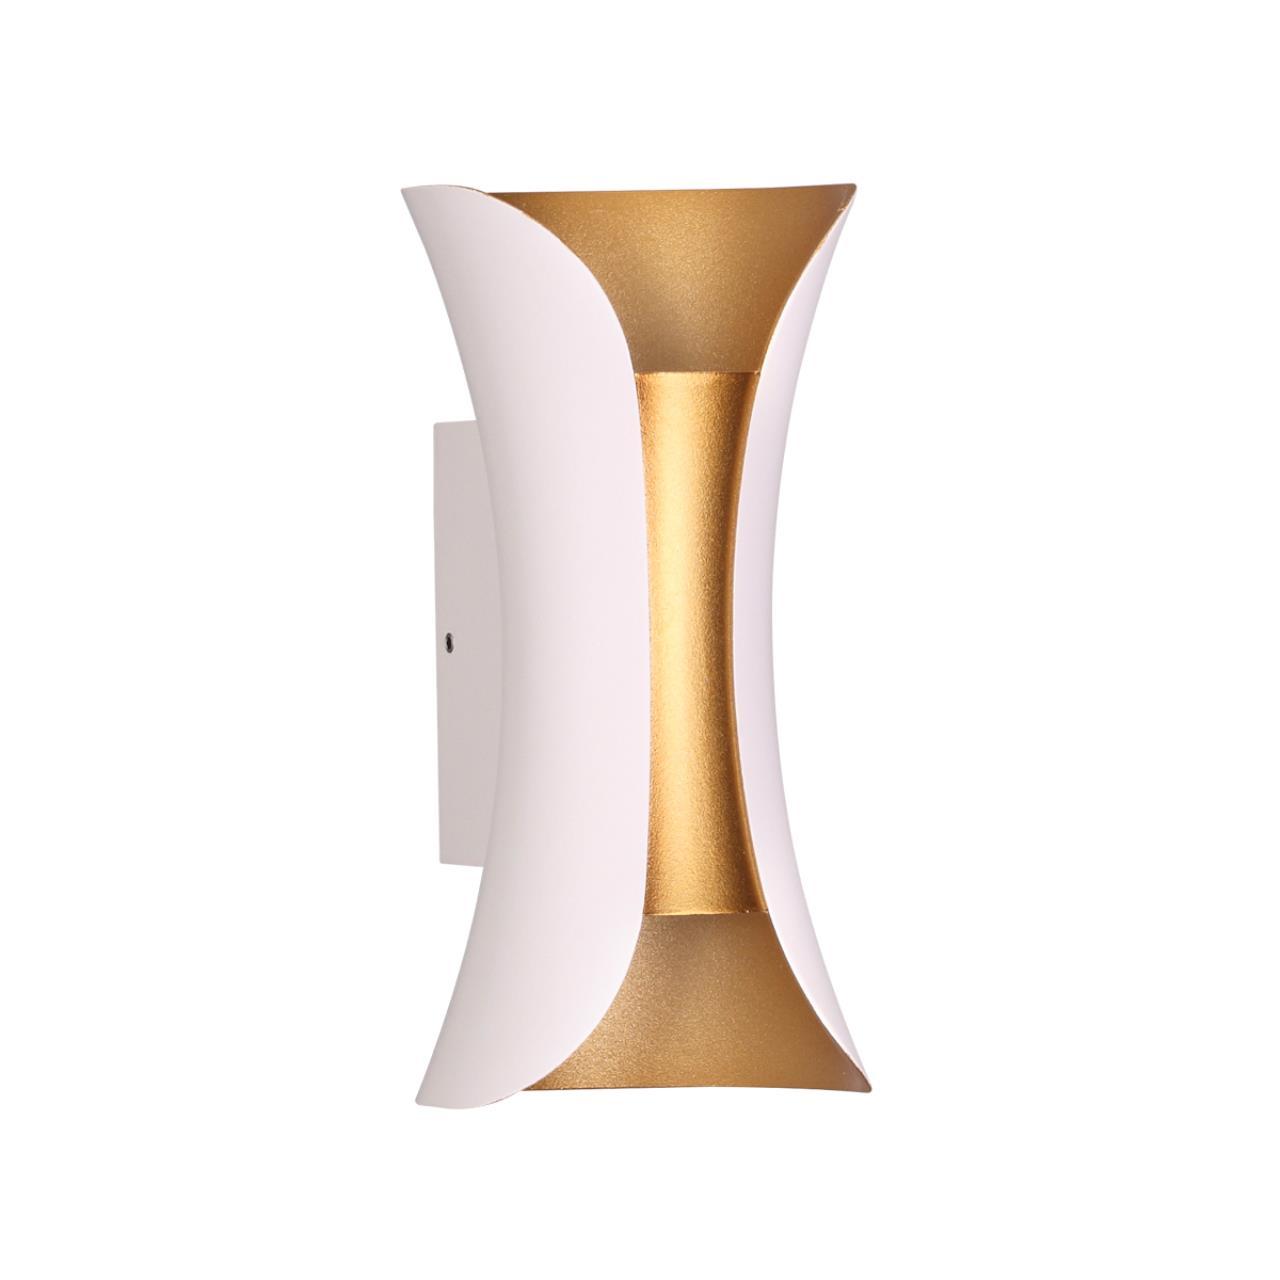 3886/6WG HIGHTECH ODL20 177 белый/золотистый/металл Настенный светильник LED 4000K 6W 220V IP54 KRIS